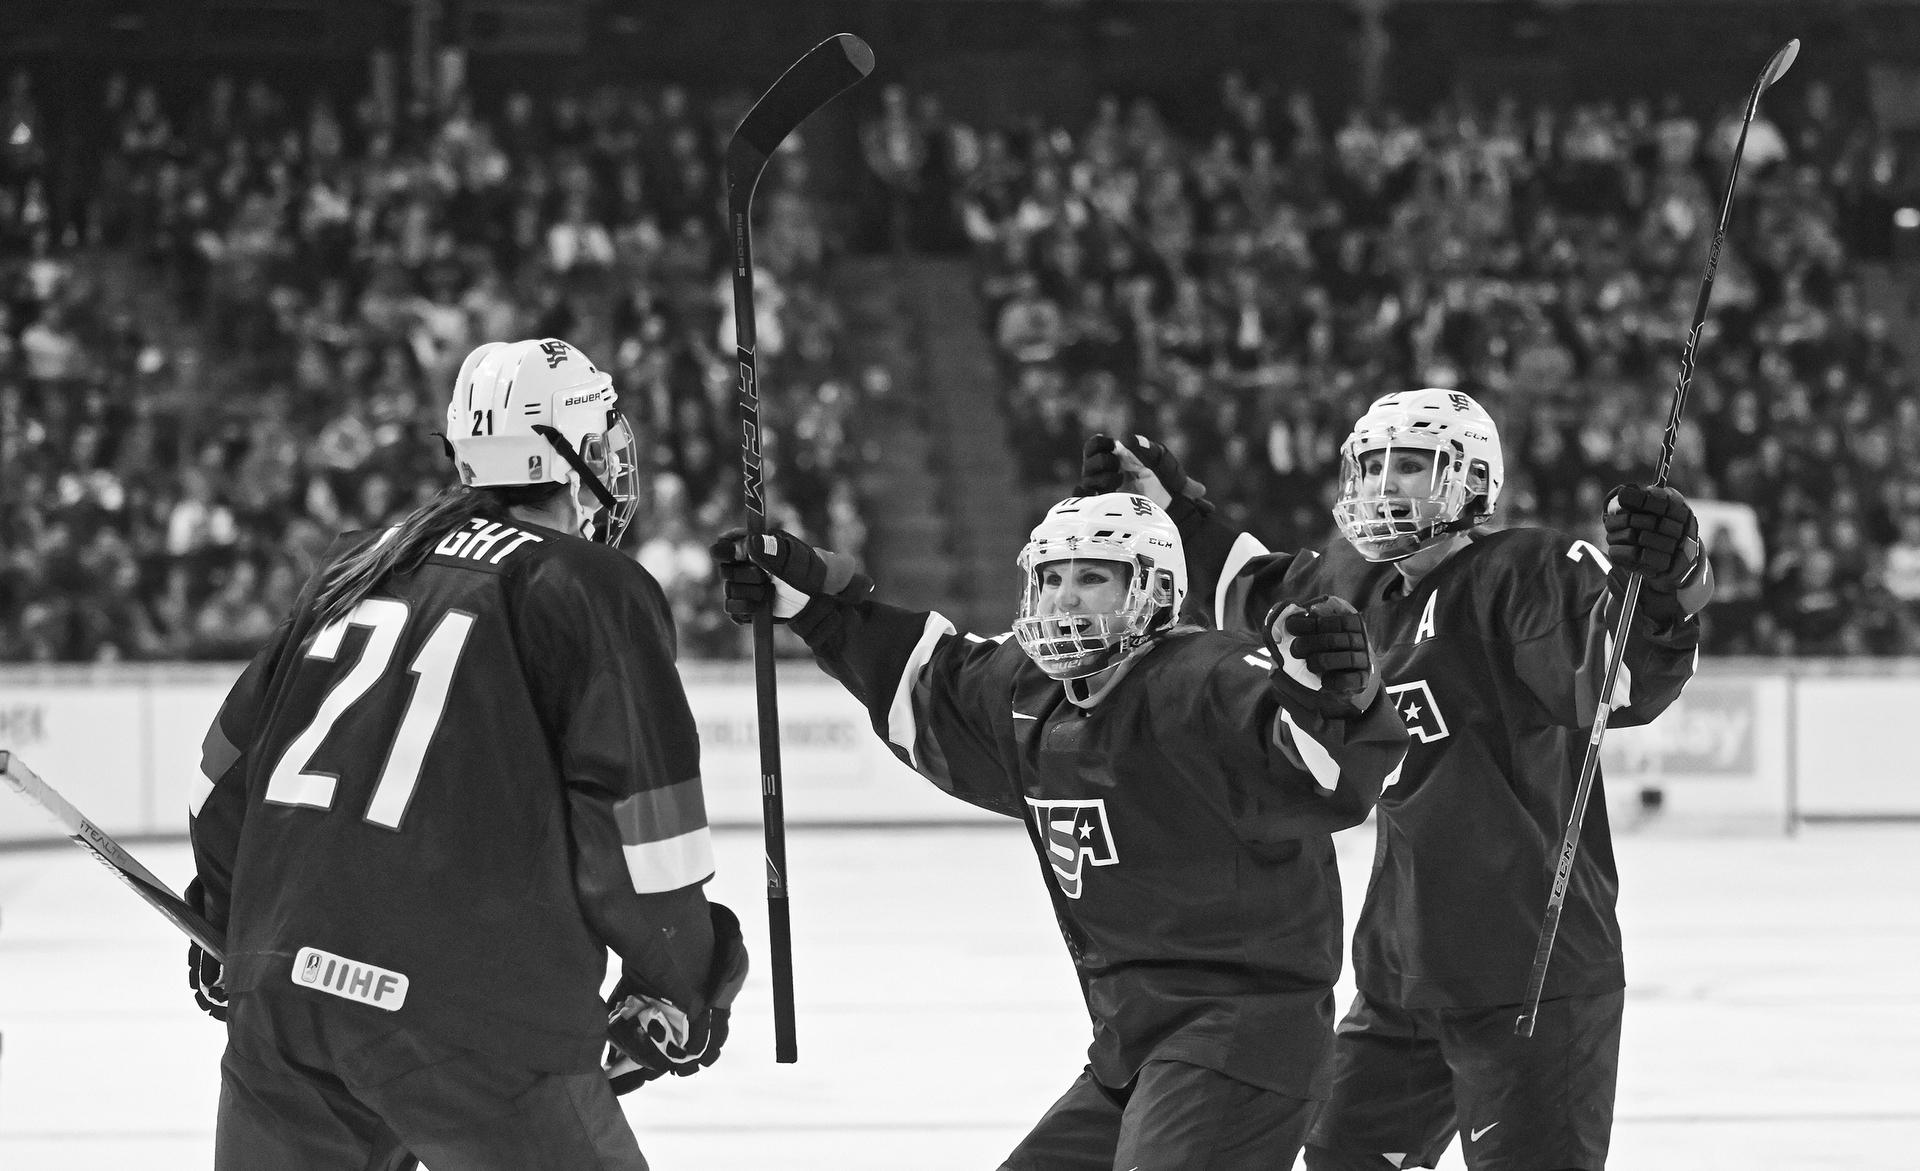 USA Women' Hockey (Photo by David E. Klutho/The Players' Tribune